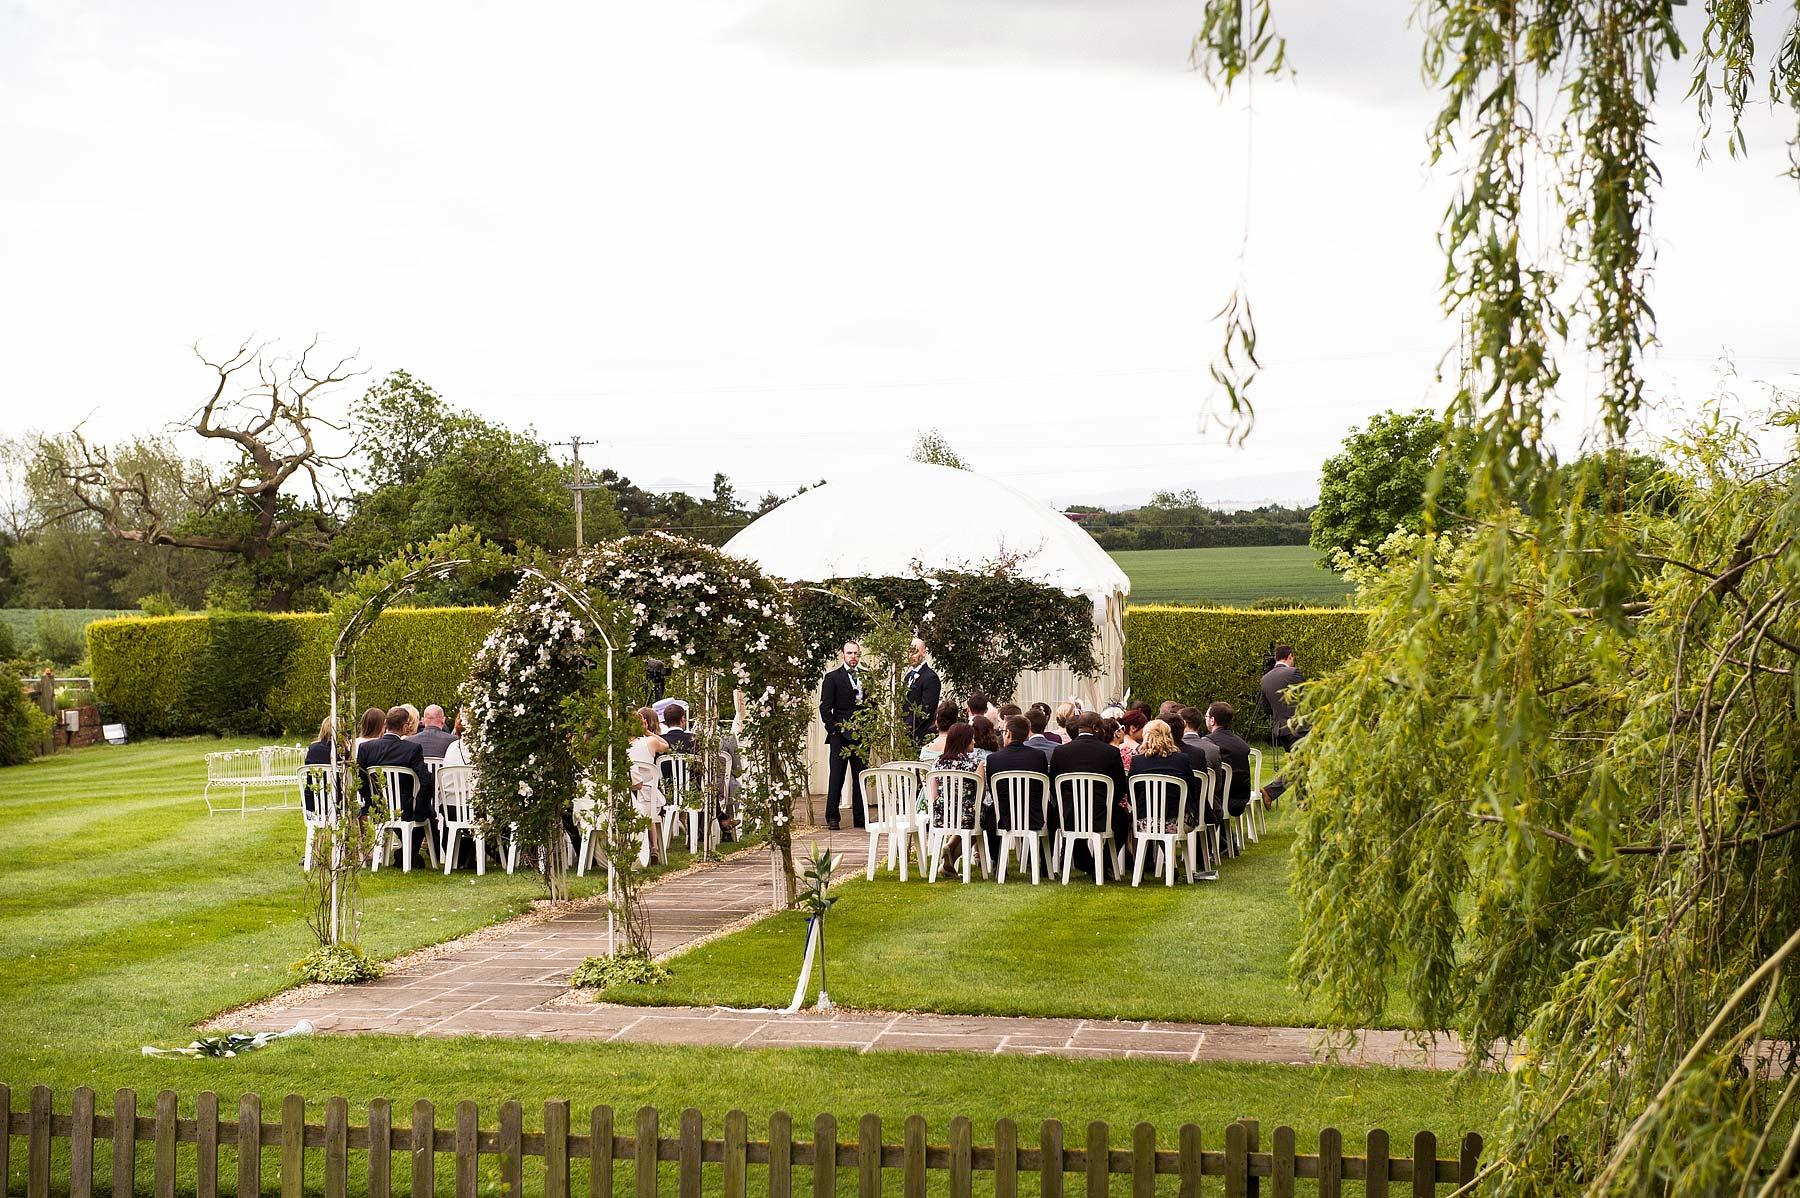 albright-hussey-manor-wedding-photographers-022